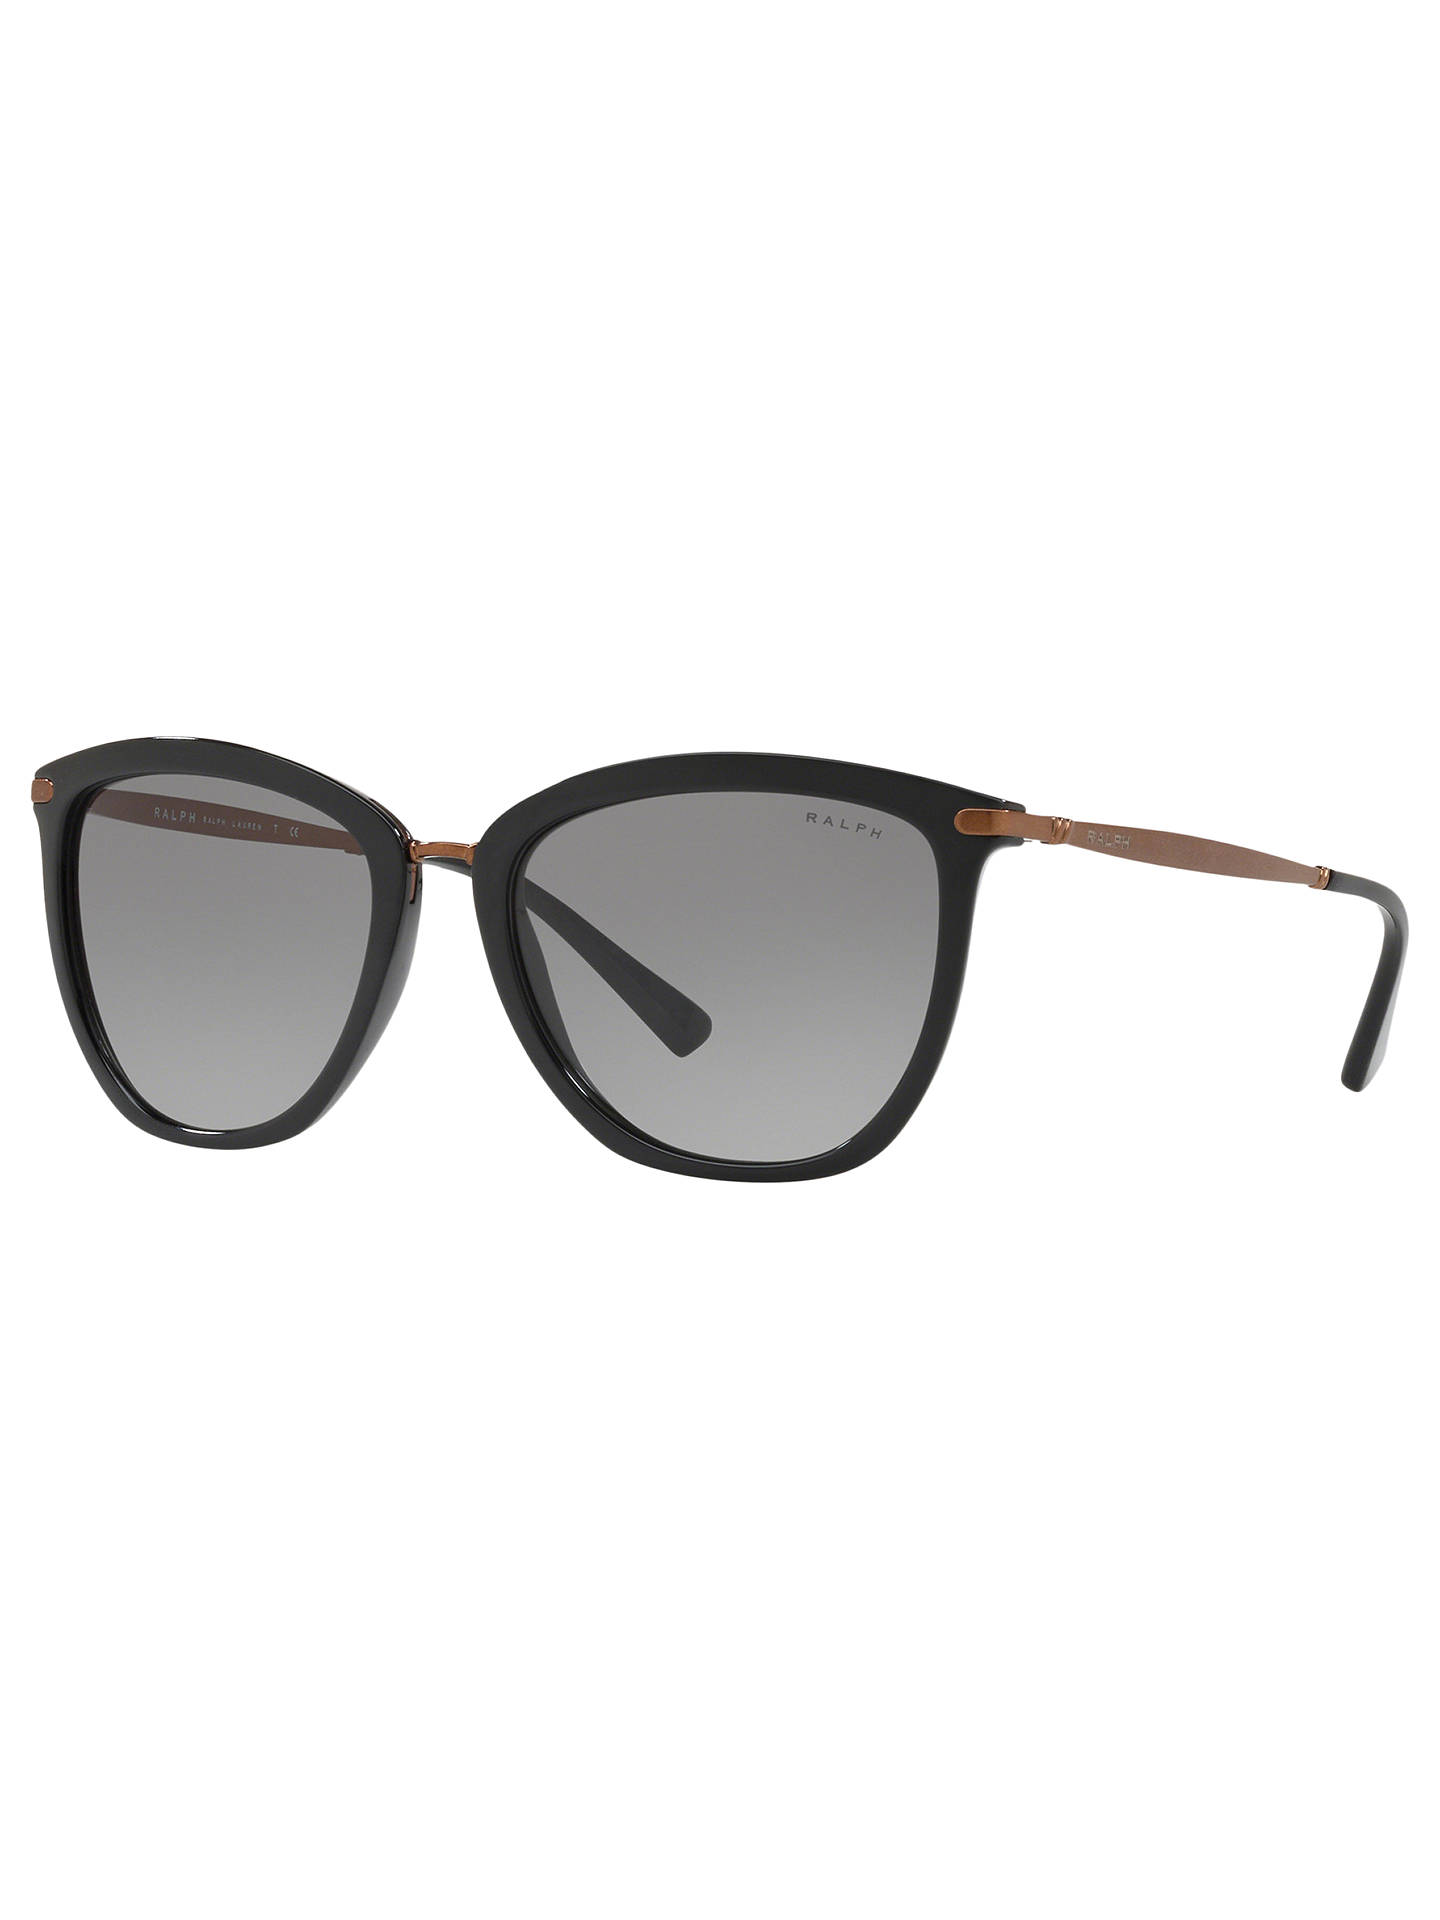 406ac161494d5 Buy Ralph RA5245 Women s Cat s Eye Sunglasses